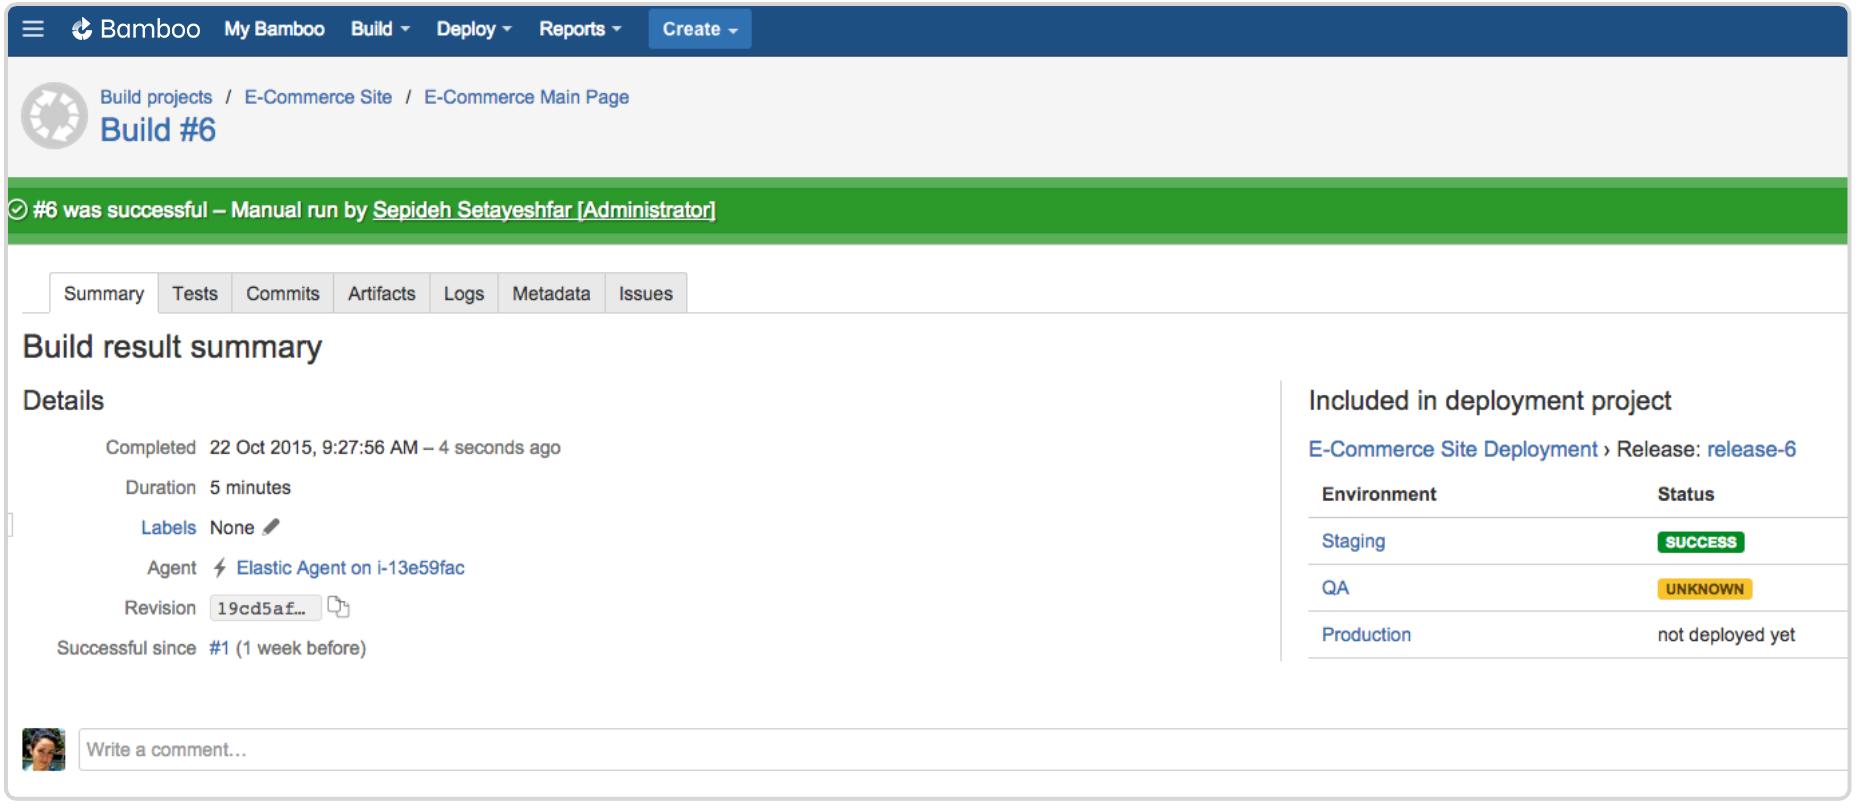 Bamboo build result summary screenshot